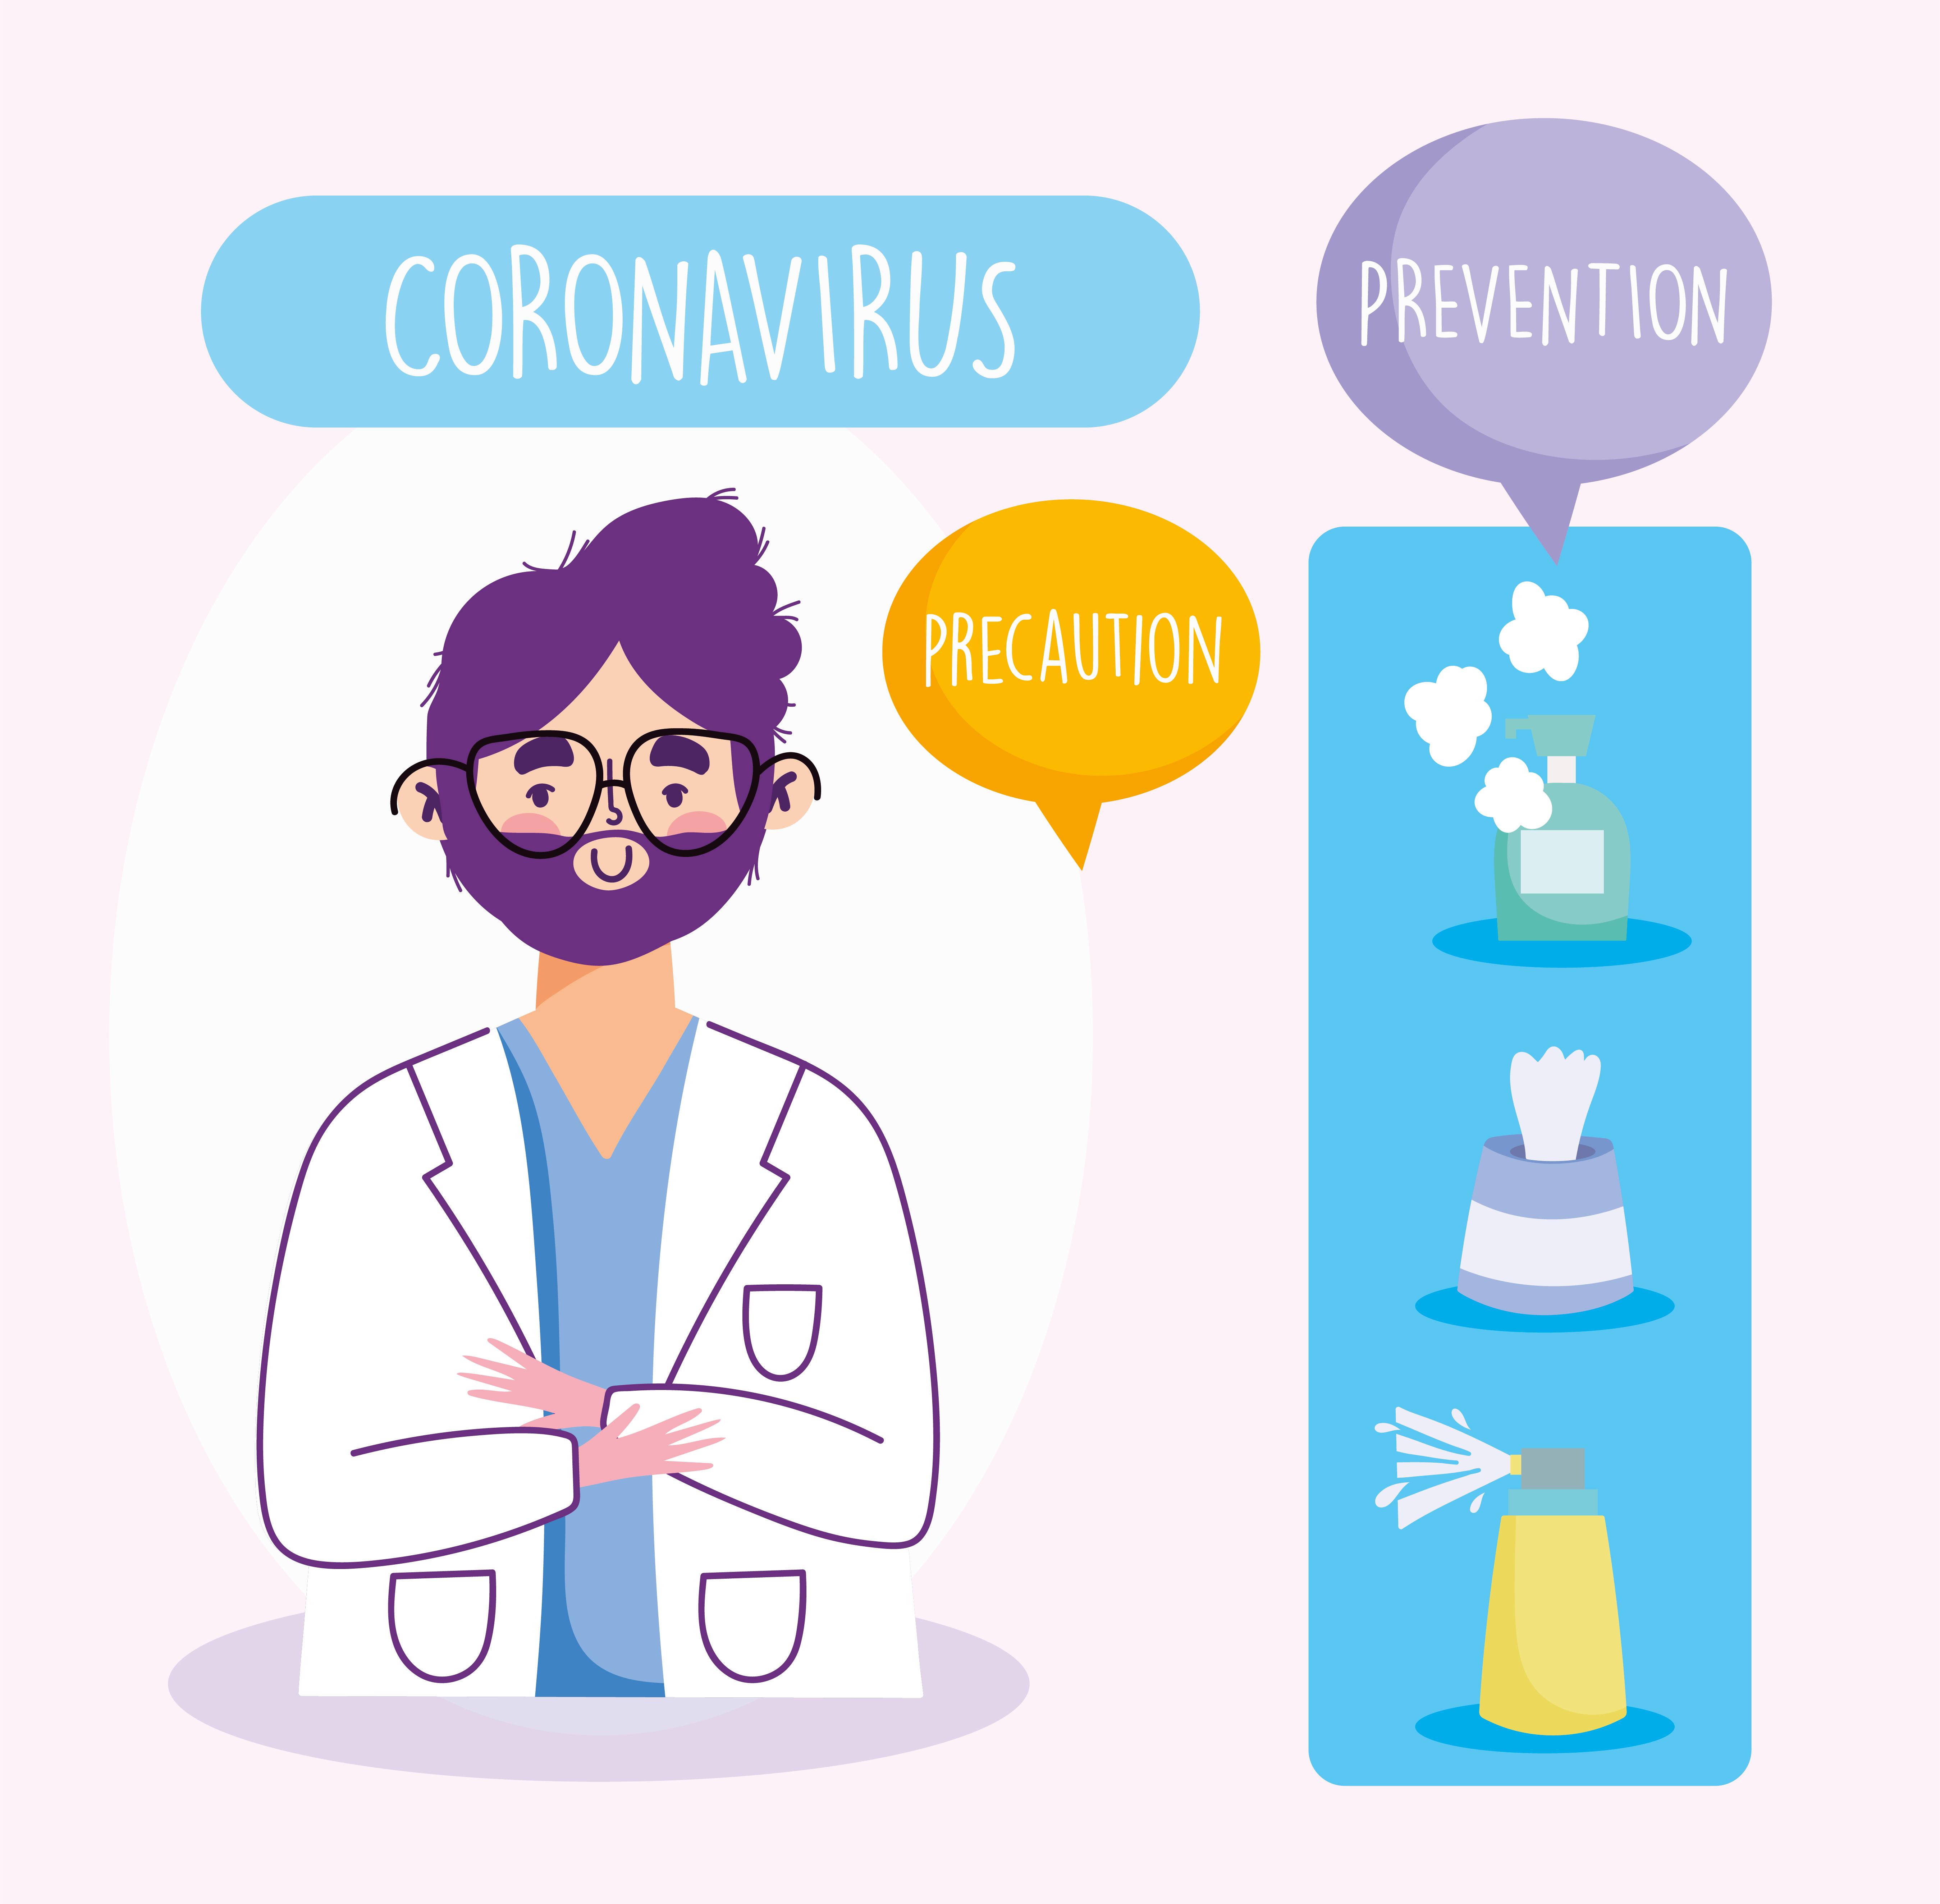 Coronavirus prevention infographic with doctor vector